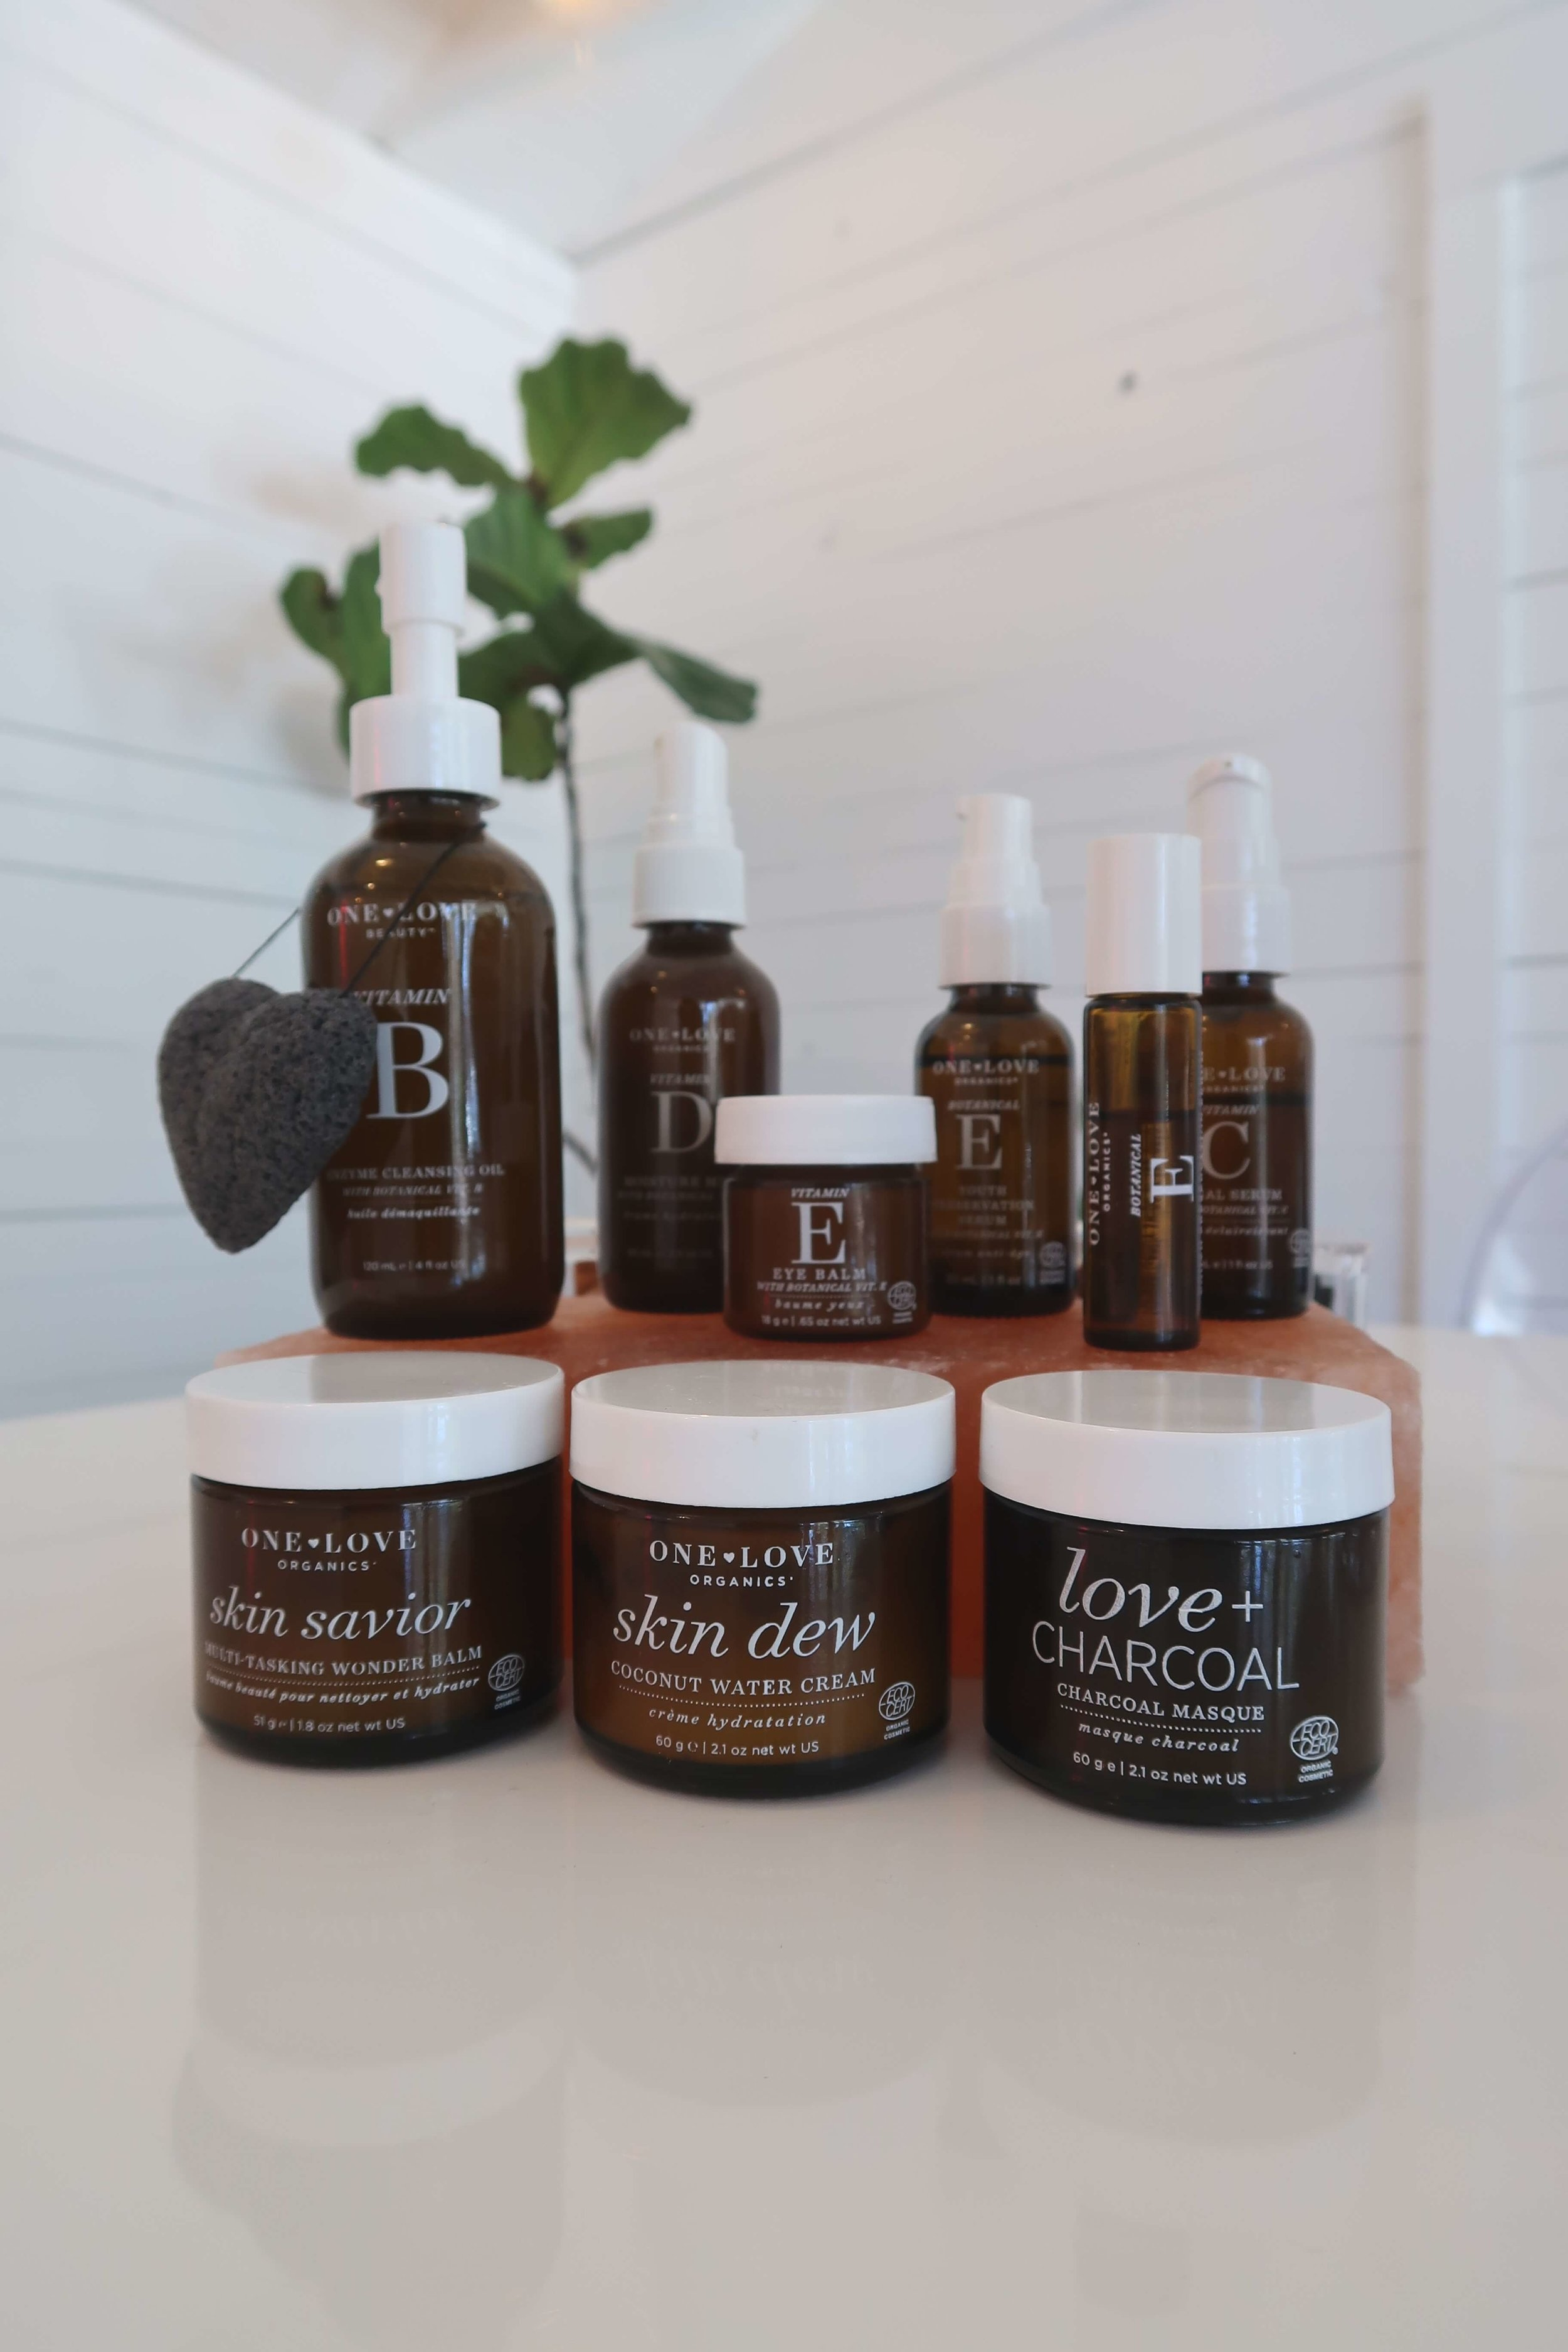 One Love Organics Skin Care